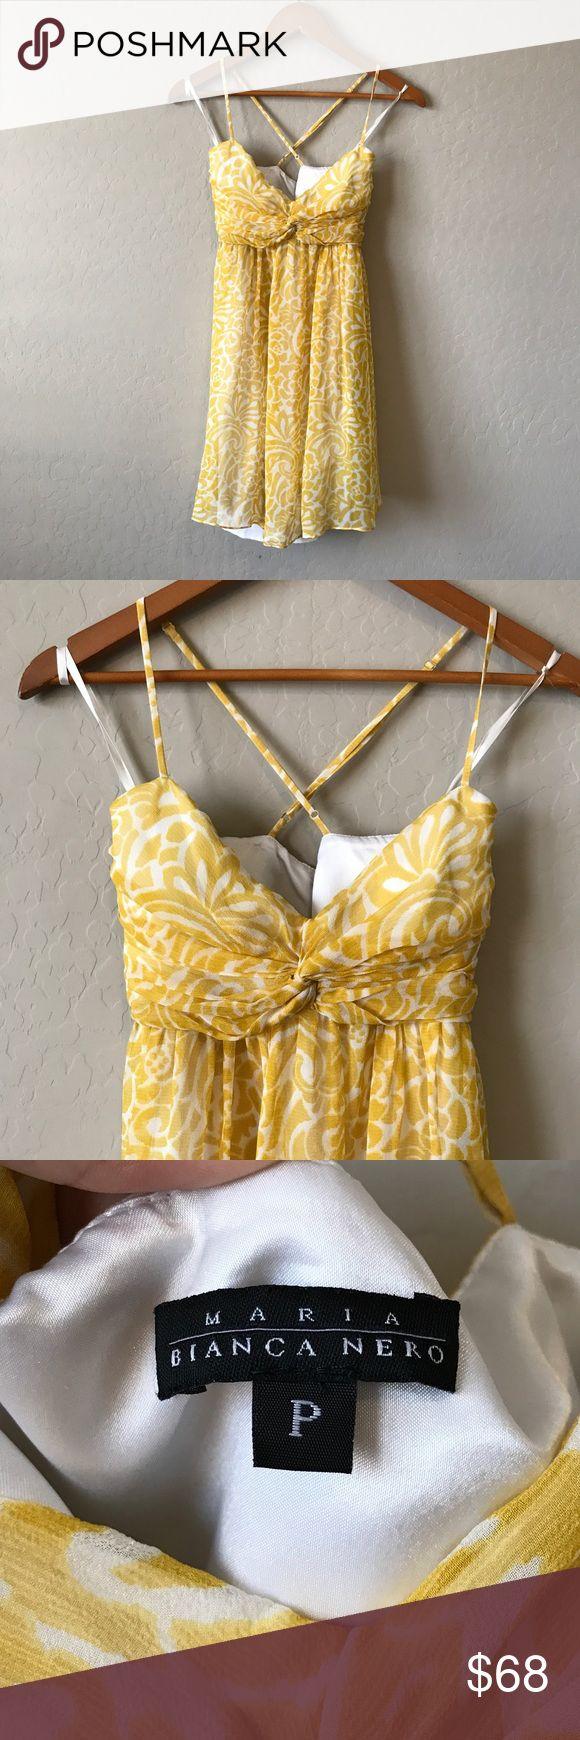 Maria Bianca Nero yellow print silk dress From Nordstrom. Yellow print with cross cross back straps! Beautiful! bianca nero Dresses